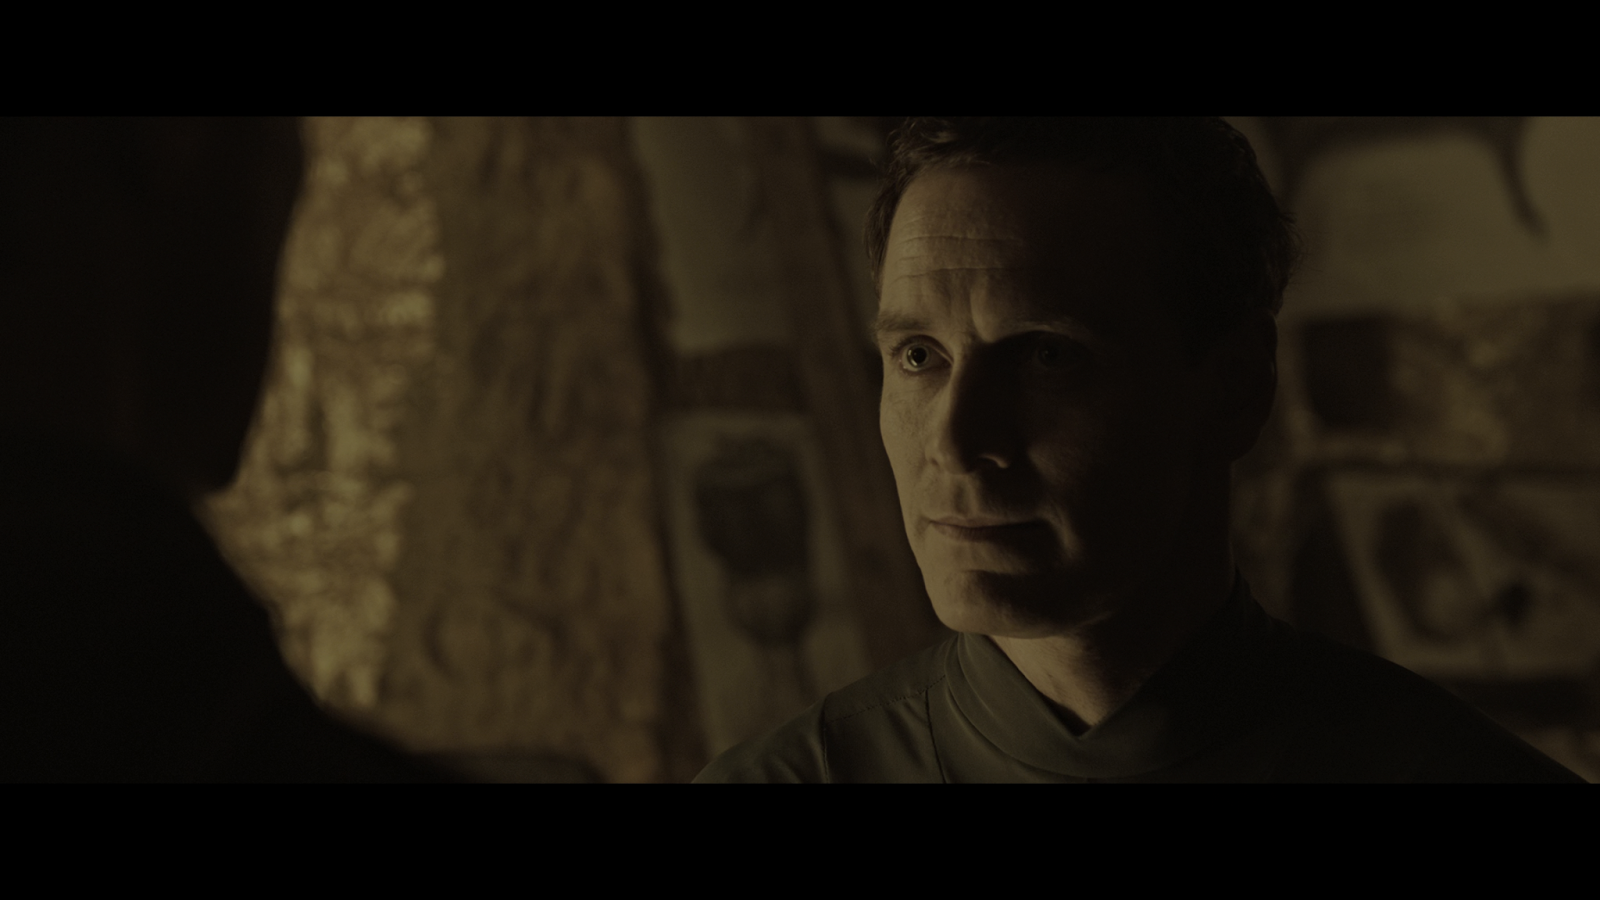 Alien: Covenant (2017) 4K UHD Blu-Ray Completo captura 4